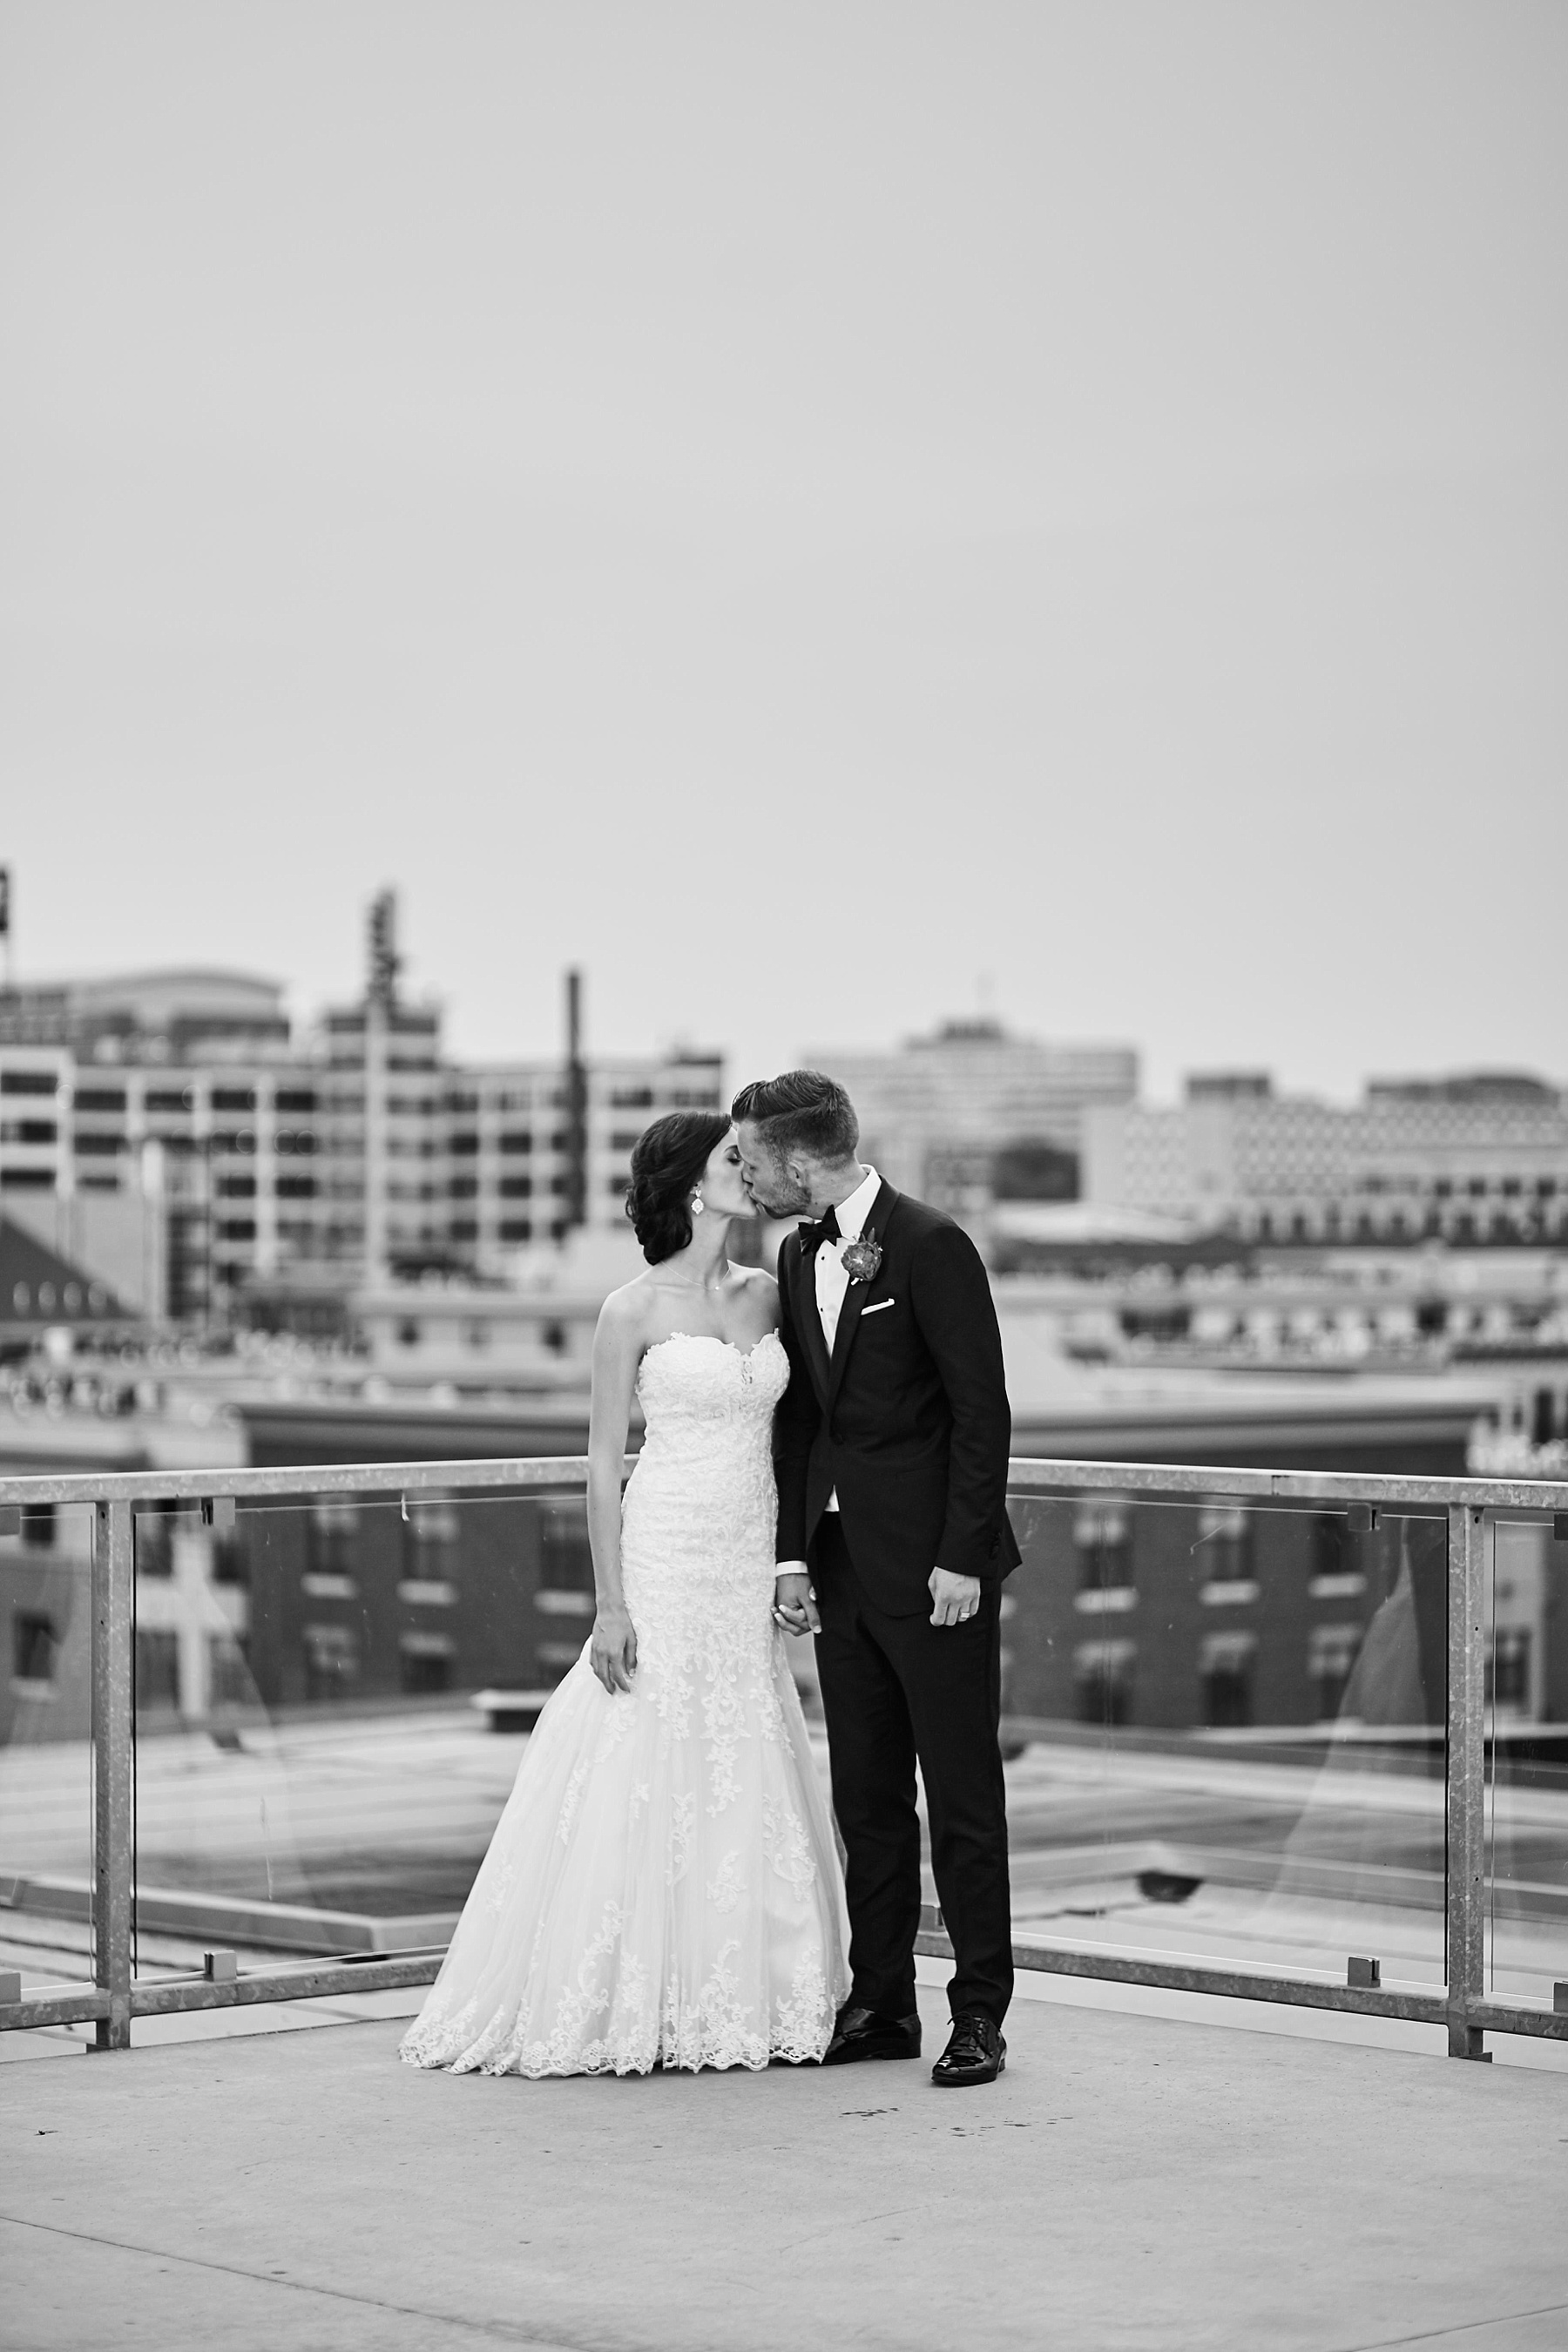 ABULAE-Wedding-Saint-paul-MN-Josh-Sofia-Wedding-Mears-Park_0817.jpg